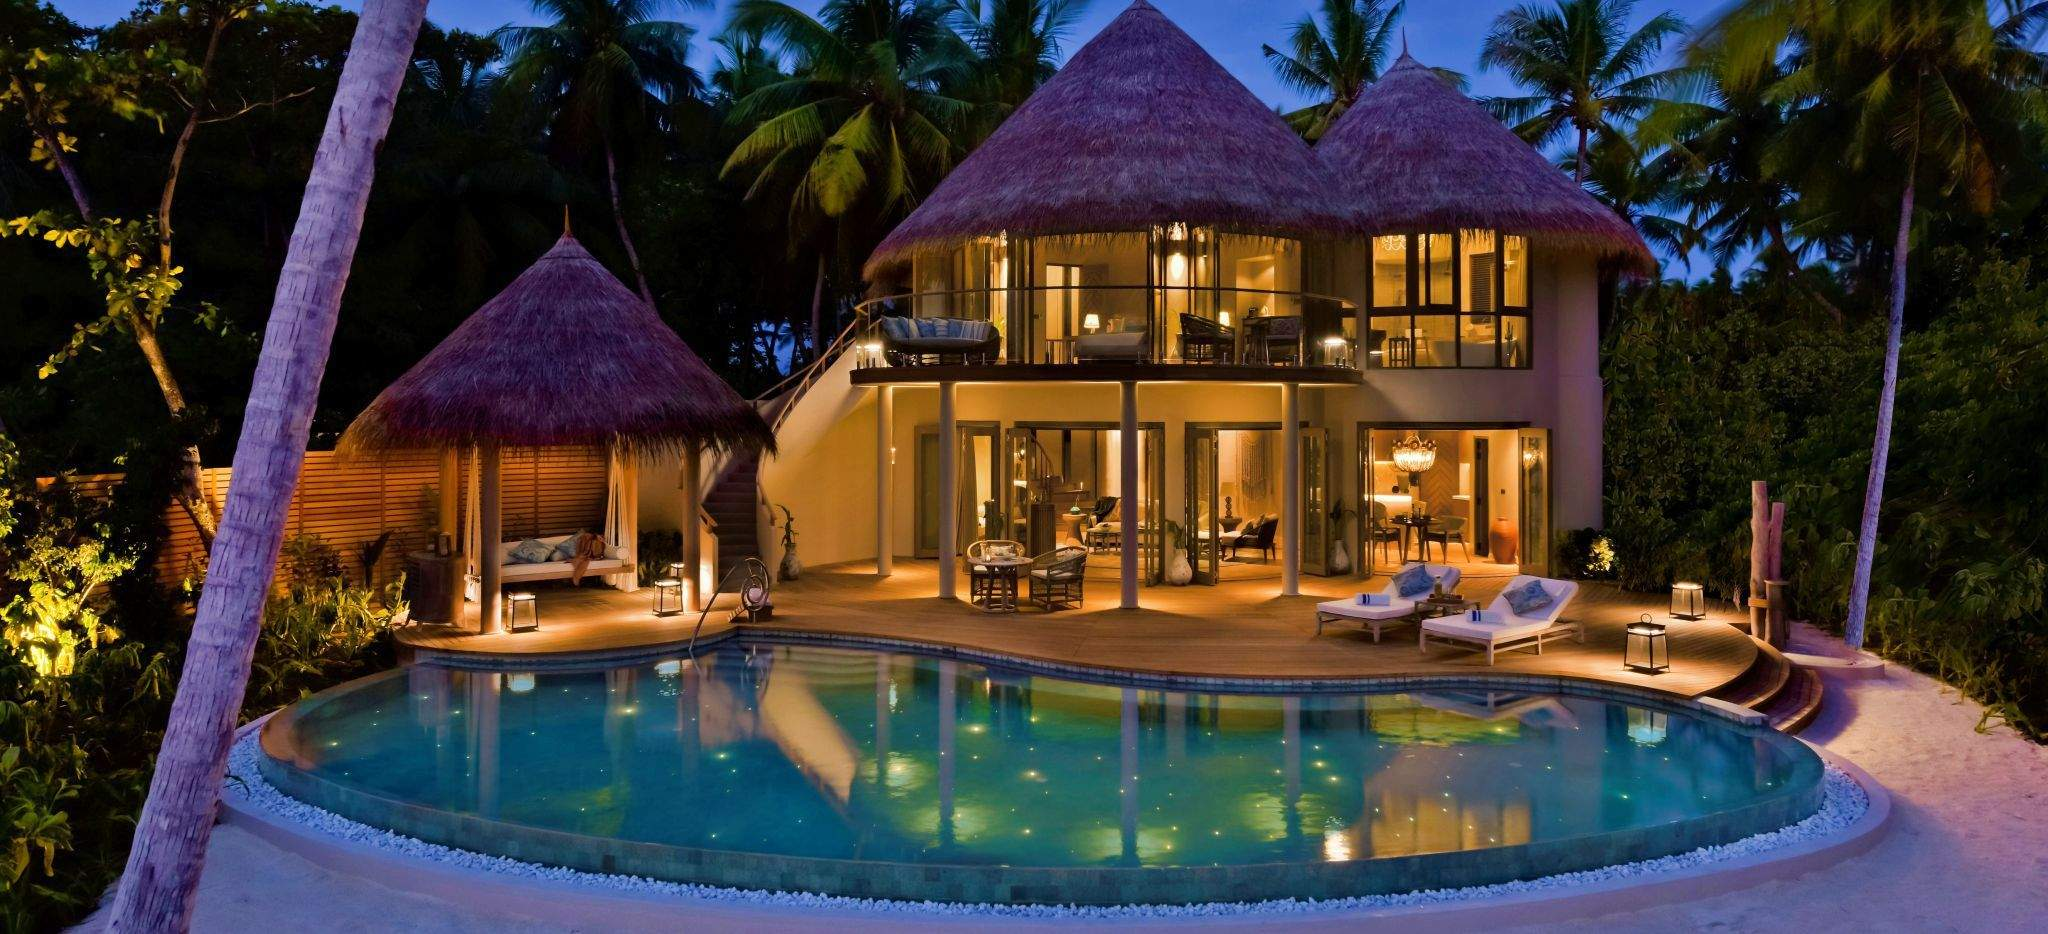 Beach Residence bei Nacht, im Hotel Nautilus, Malediven